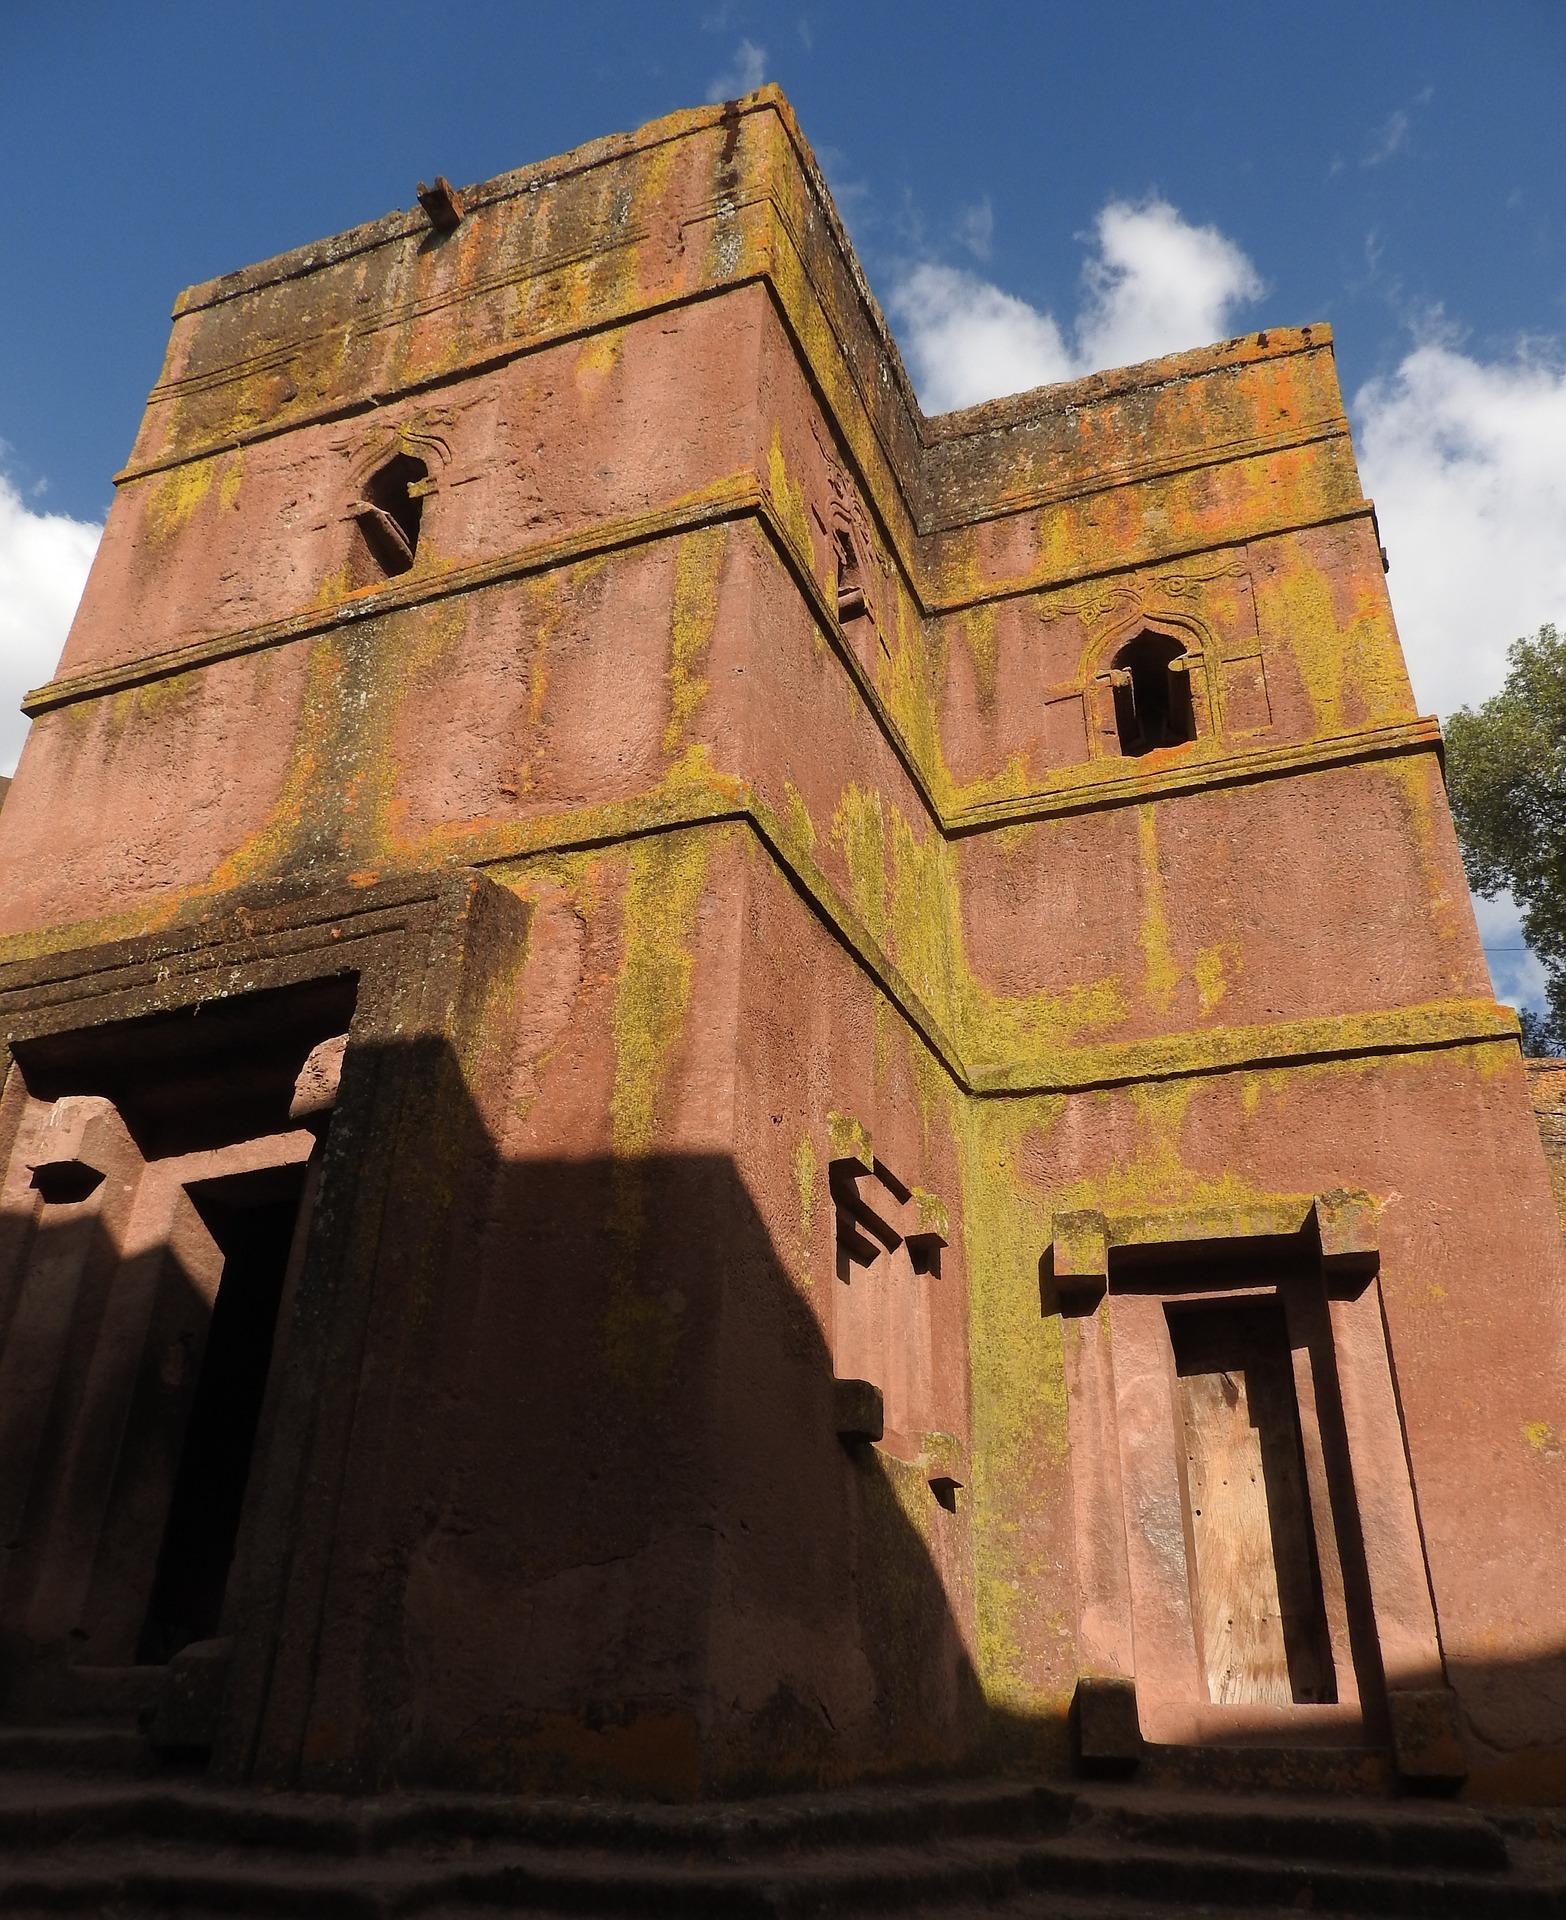 Church of Saint George in Lalibela, Ethiopia